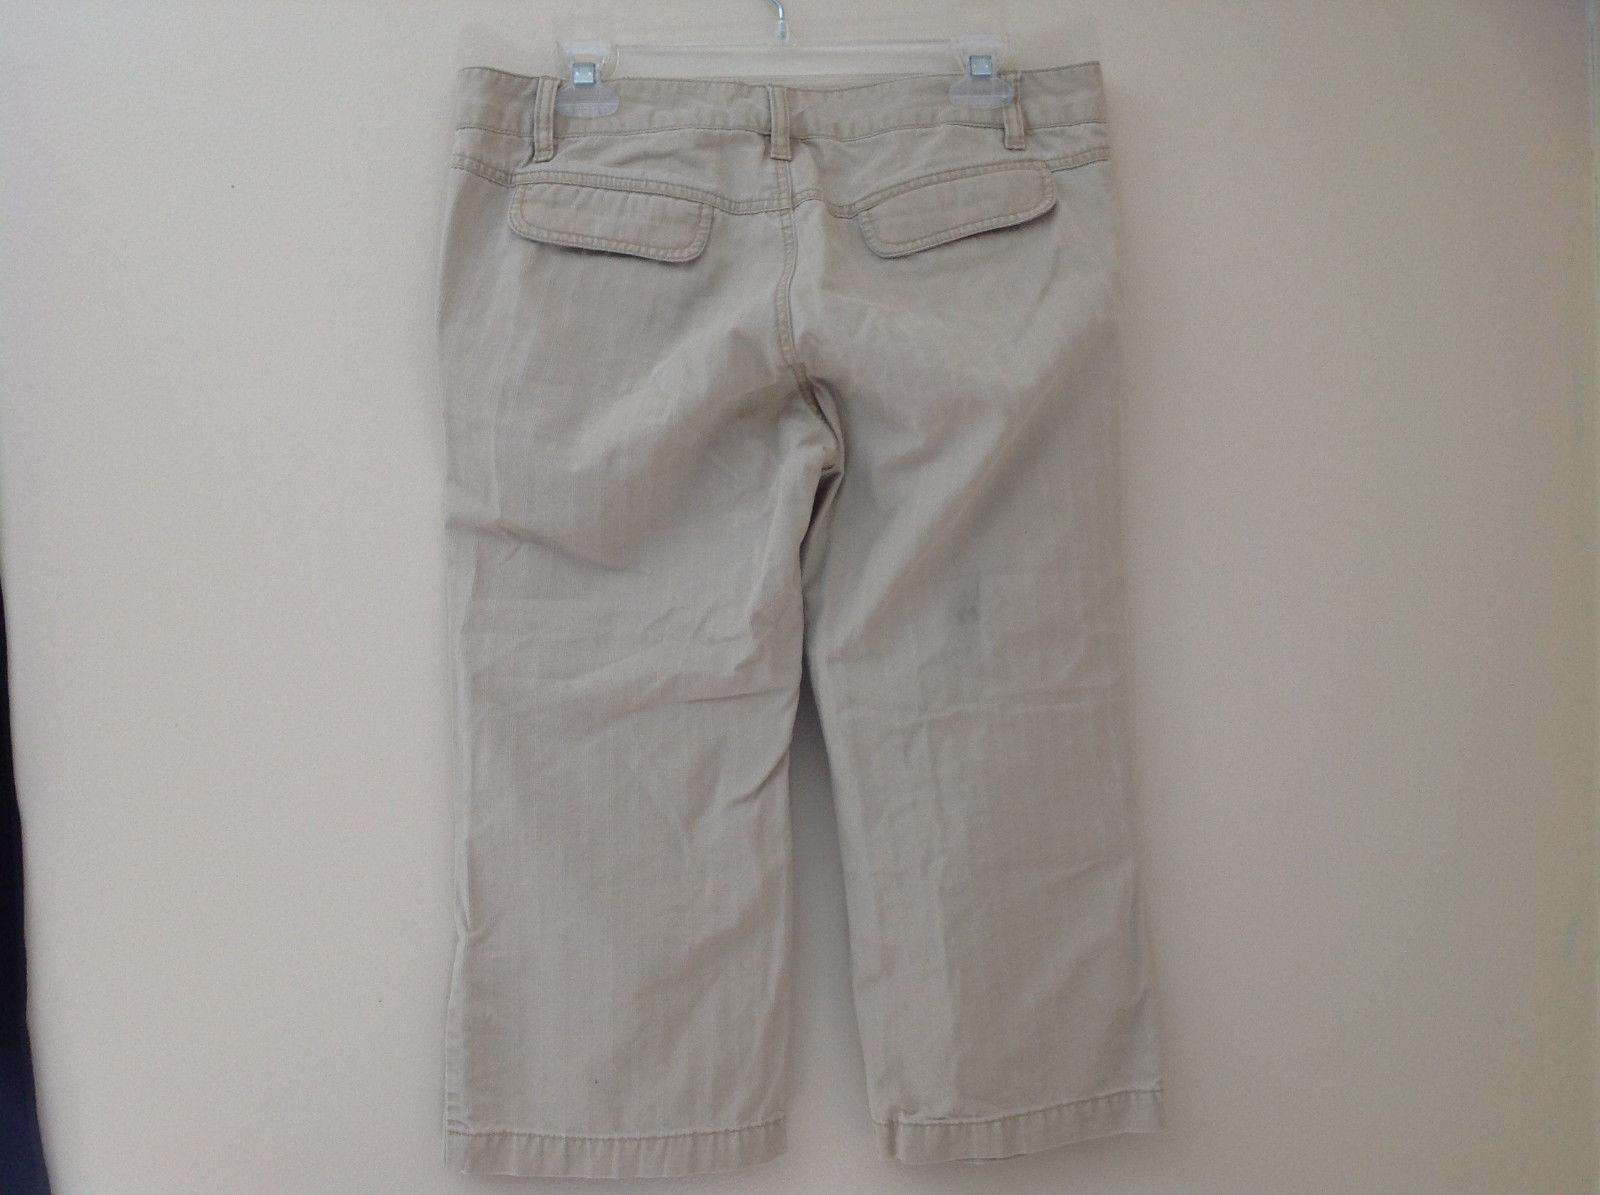 Khaki Pinstriped 4 Pocket Capri Pants Old Navy Zip Button Closure Size 10